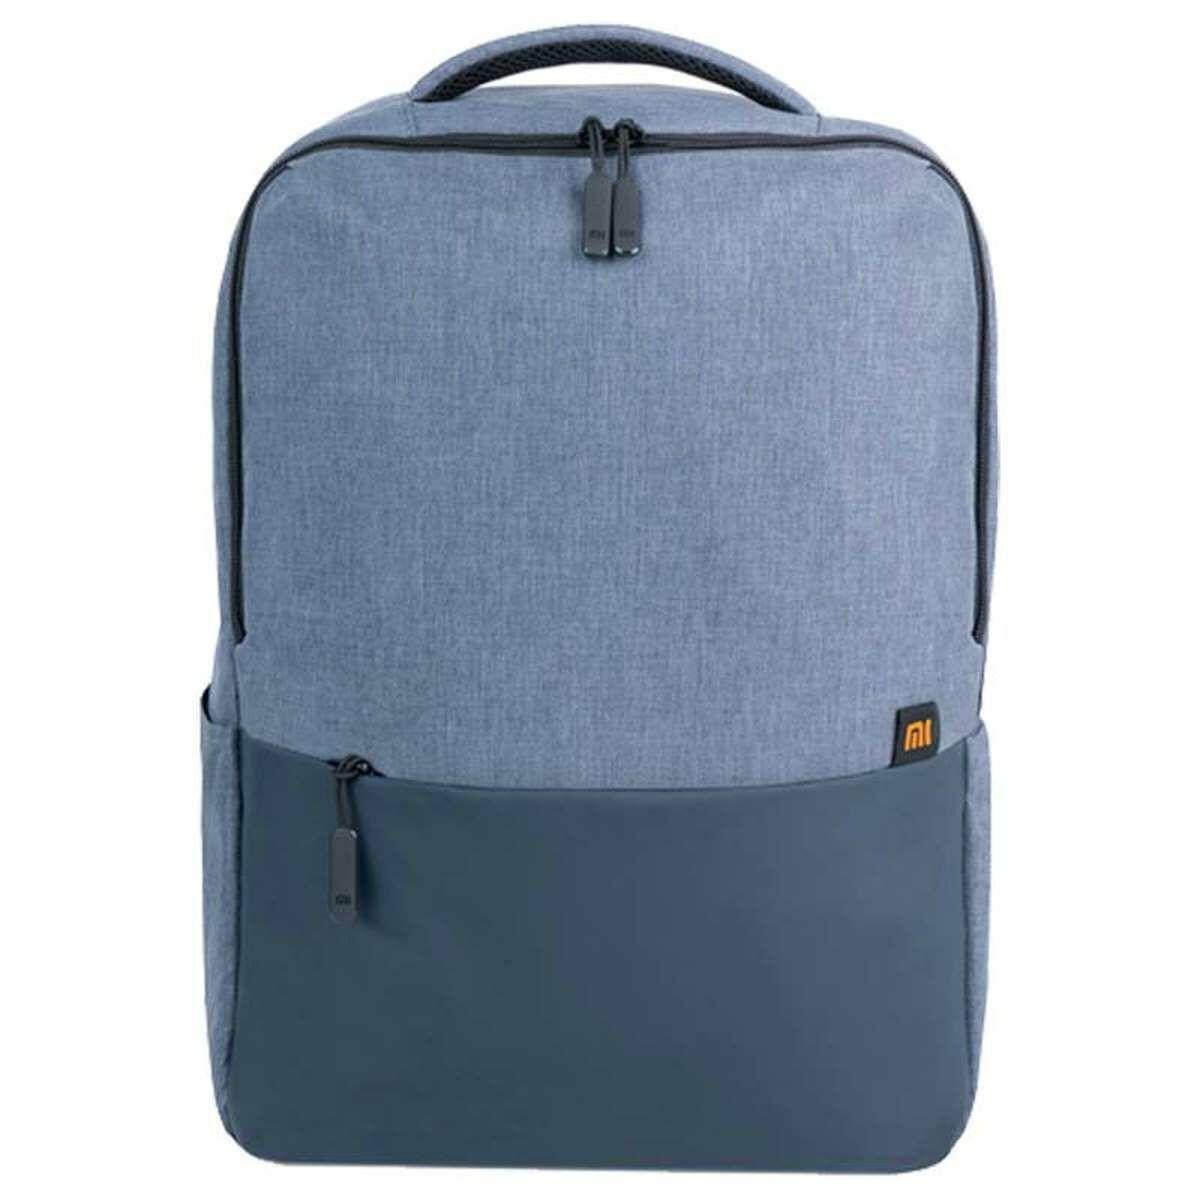 Xiaomi Mi Business Casual Backpack, hátizsák kék EU BHR4905GL